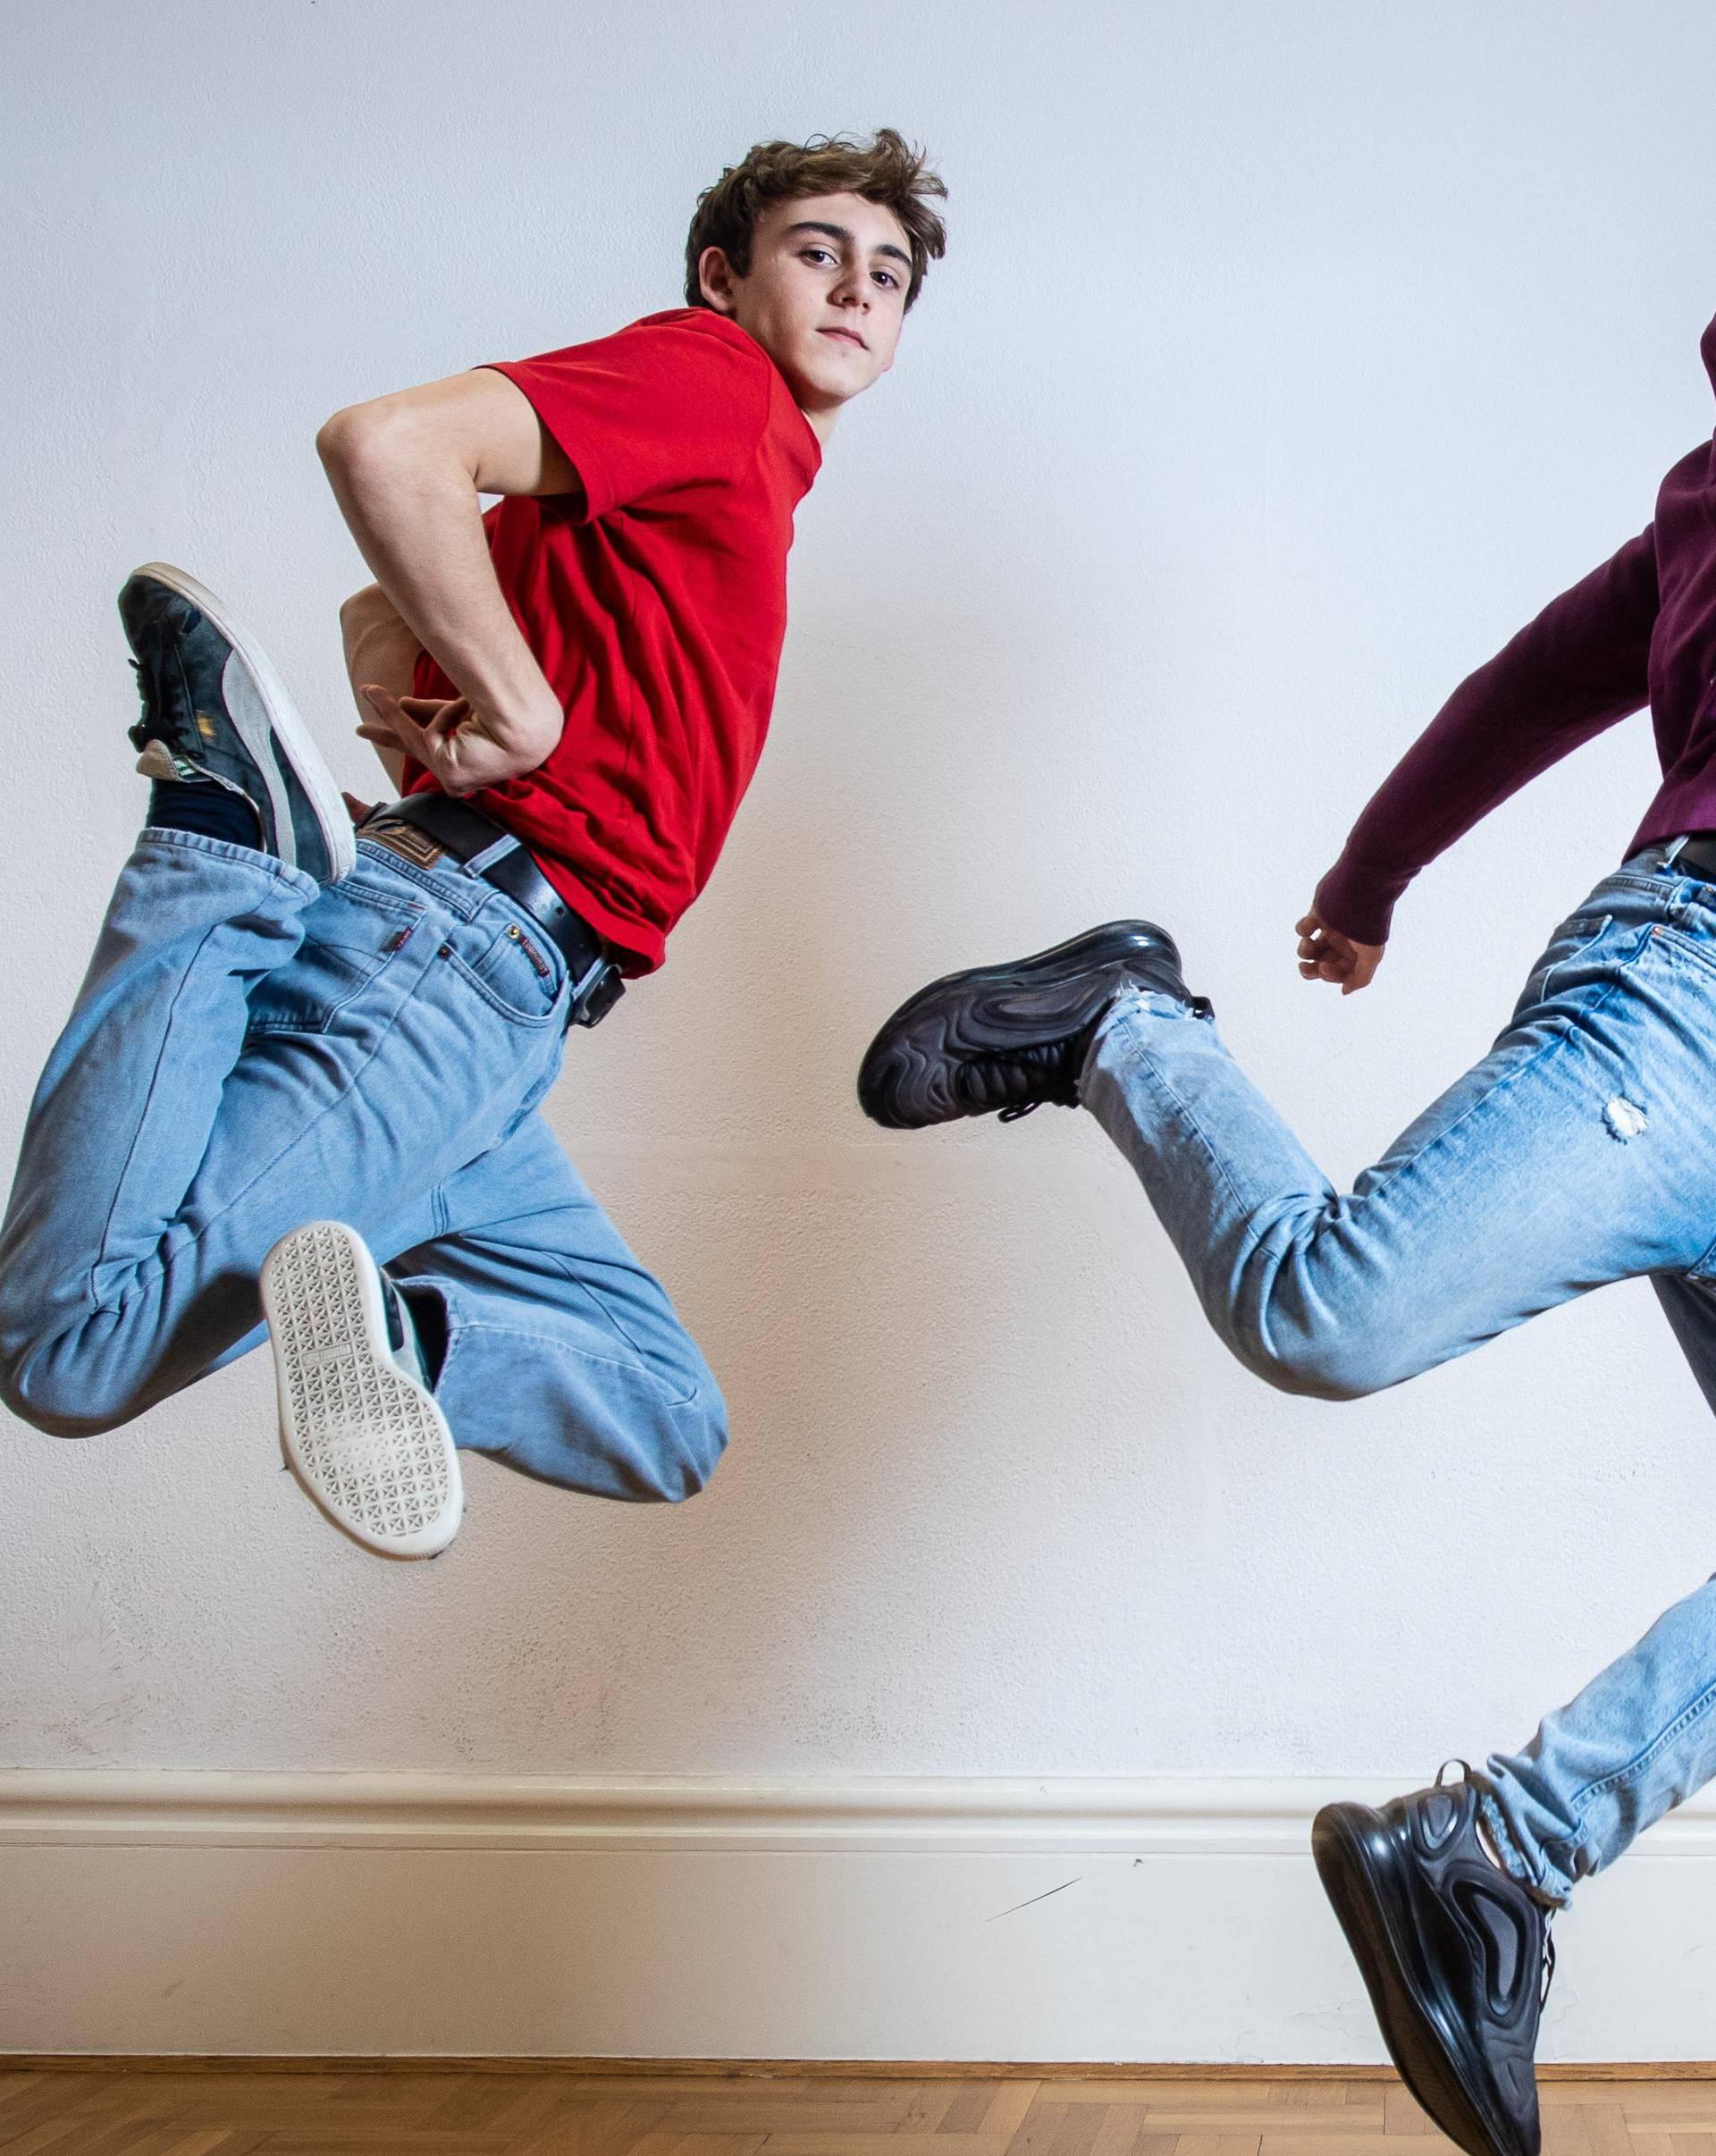 Nakon Supertalenta prebacili se na YouTube: 'I baka pleše...'